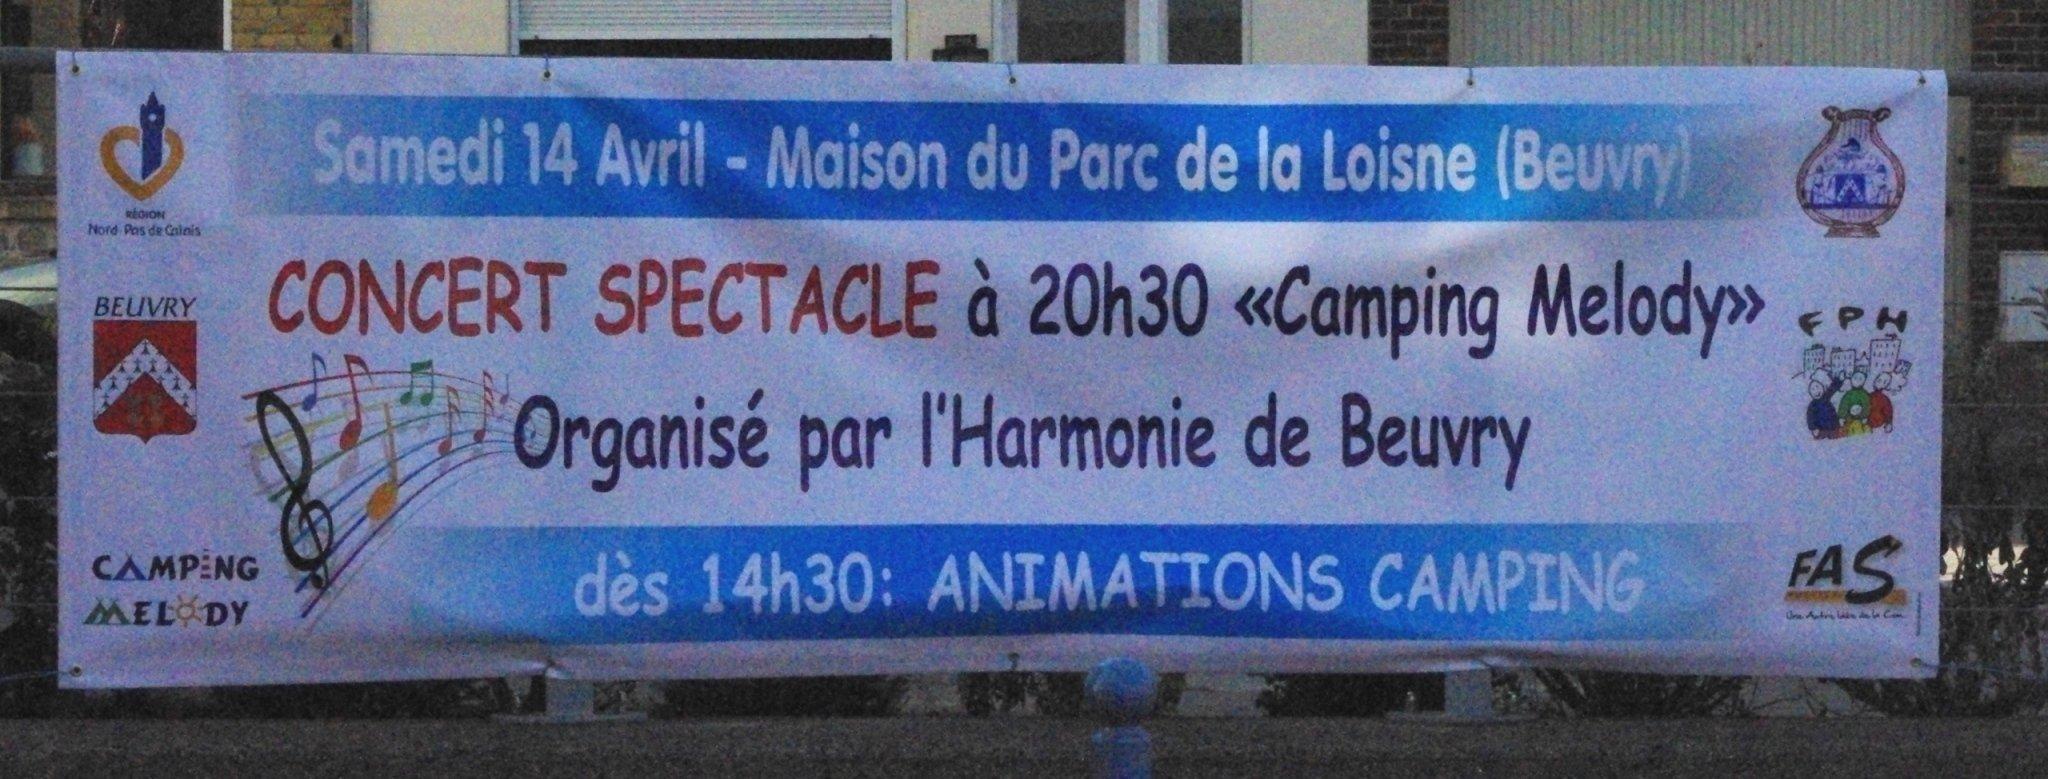 14 avril 2012 à Beuvry - Camping Melody : Après-midi festive et Concert Spectacle BACHE